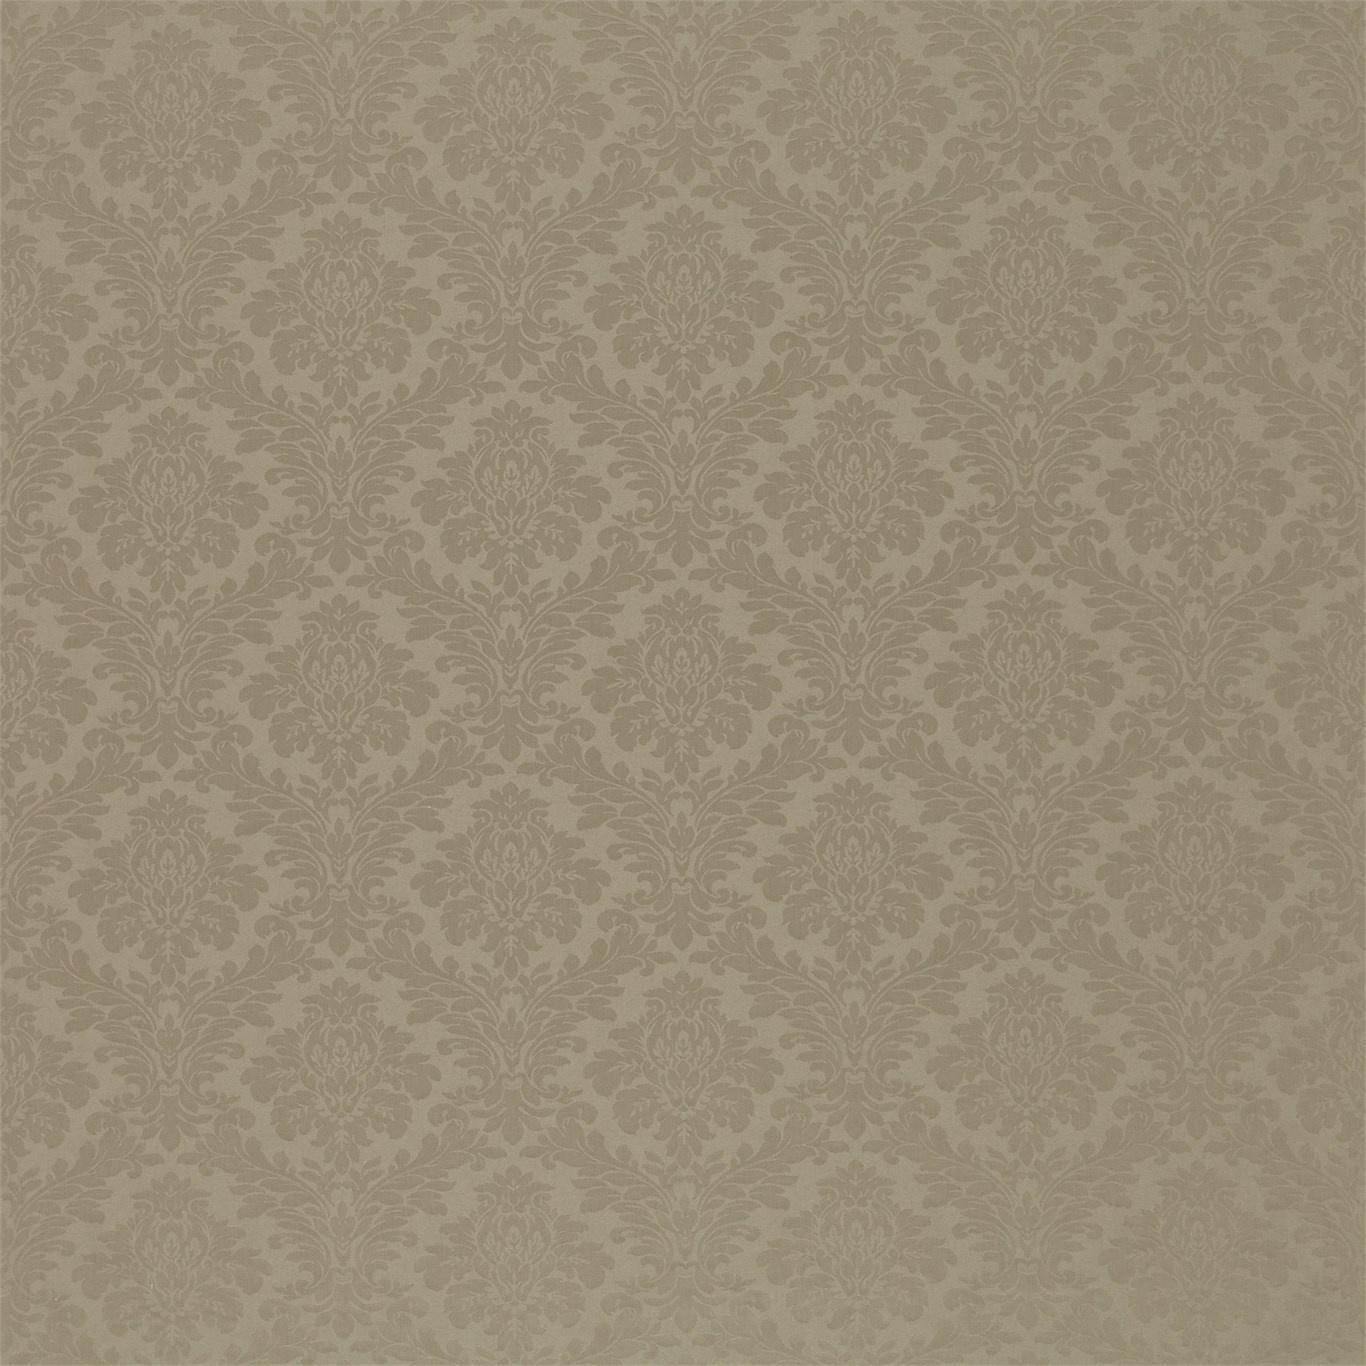 Image of Sanderson Lymington Damask Taupe Fabric 232607